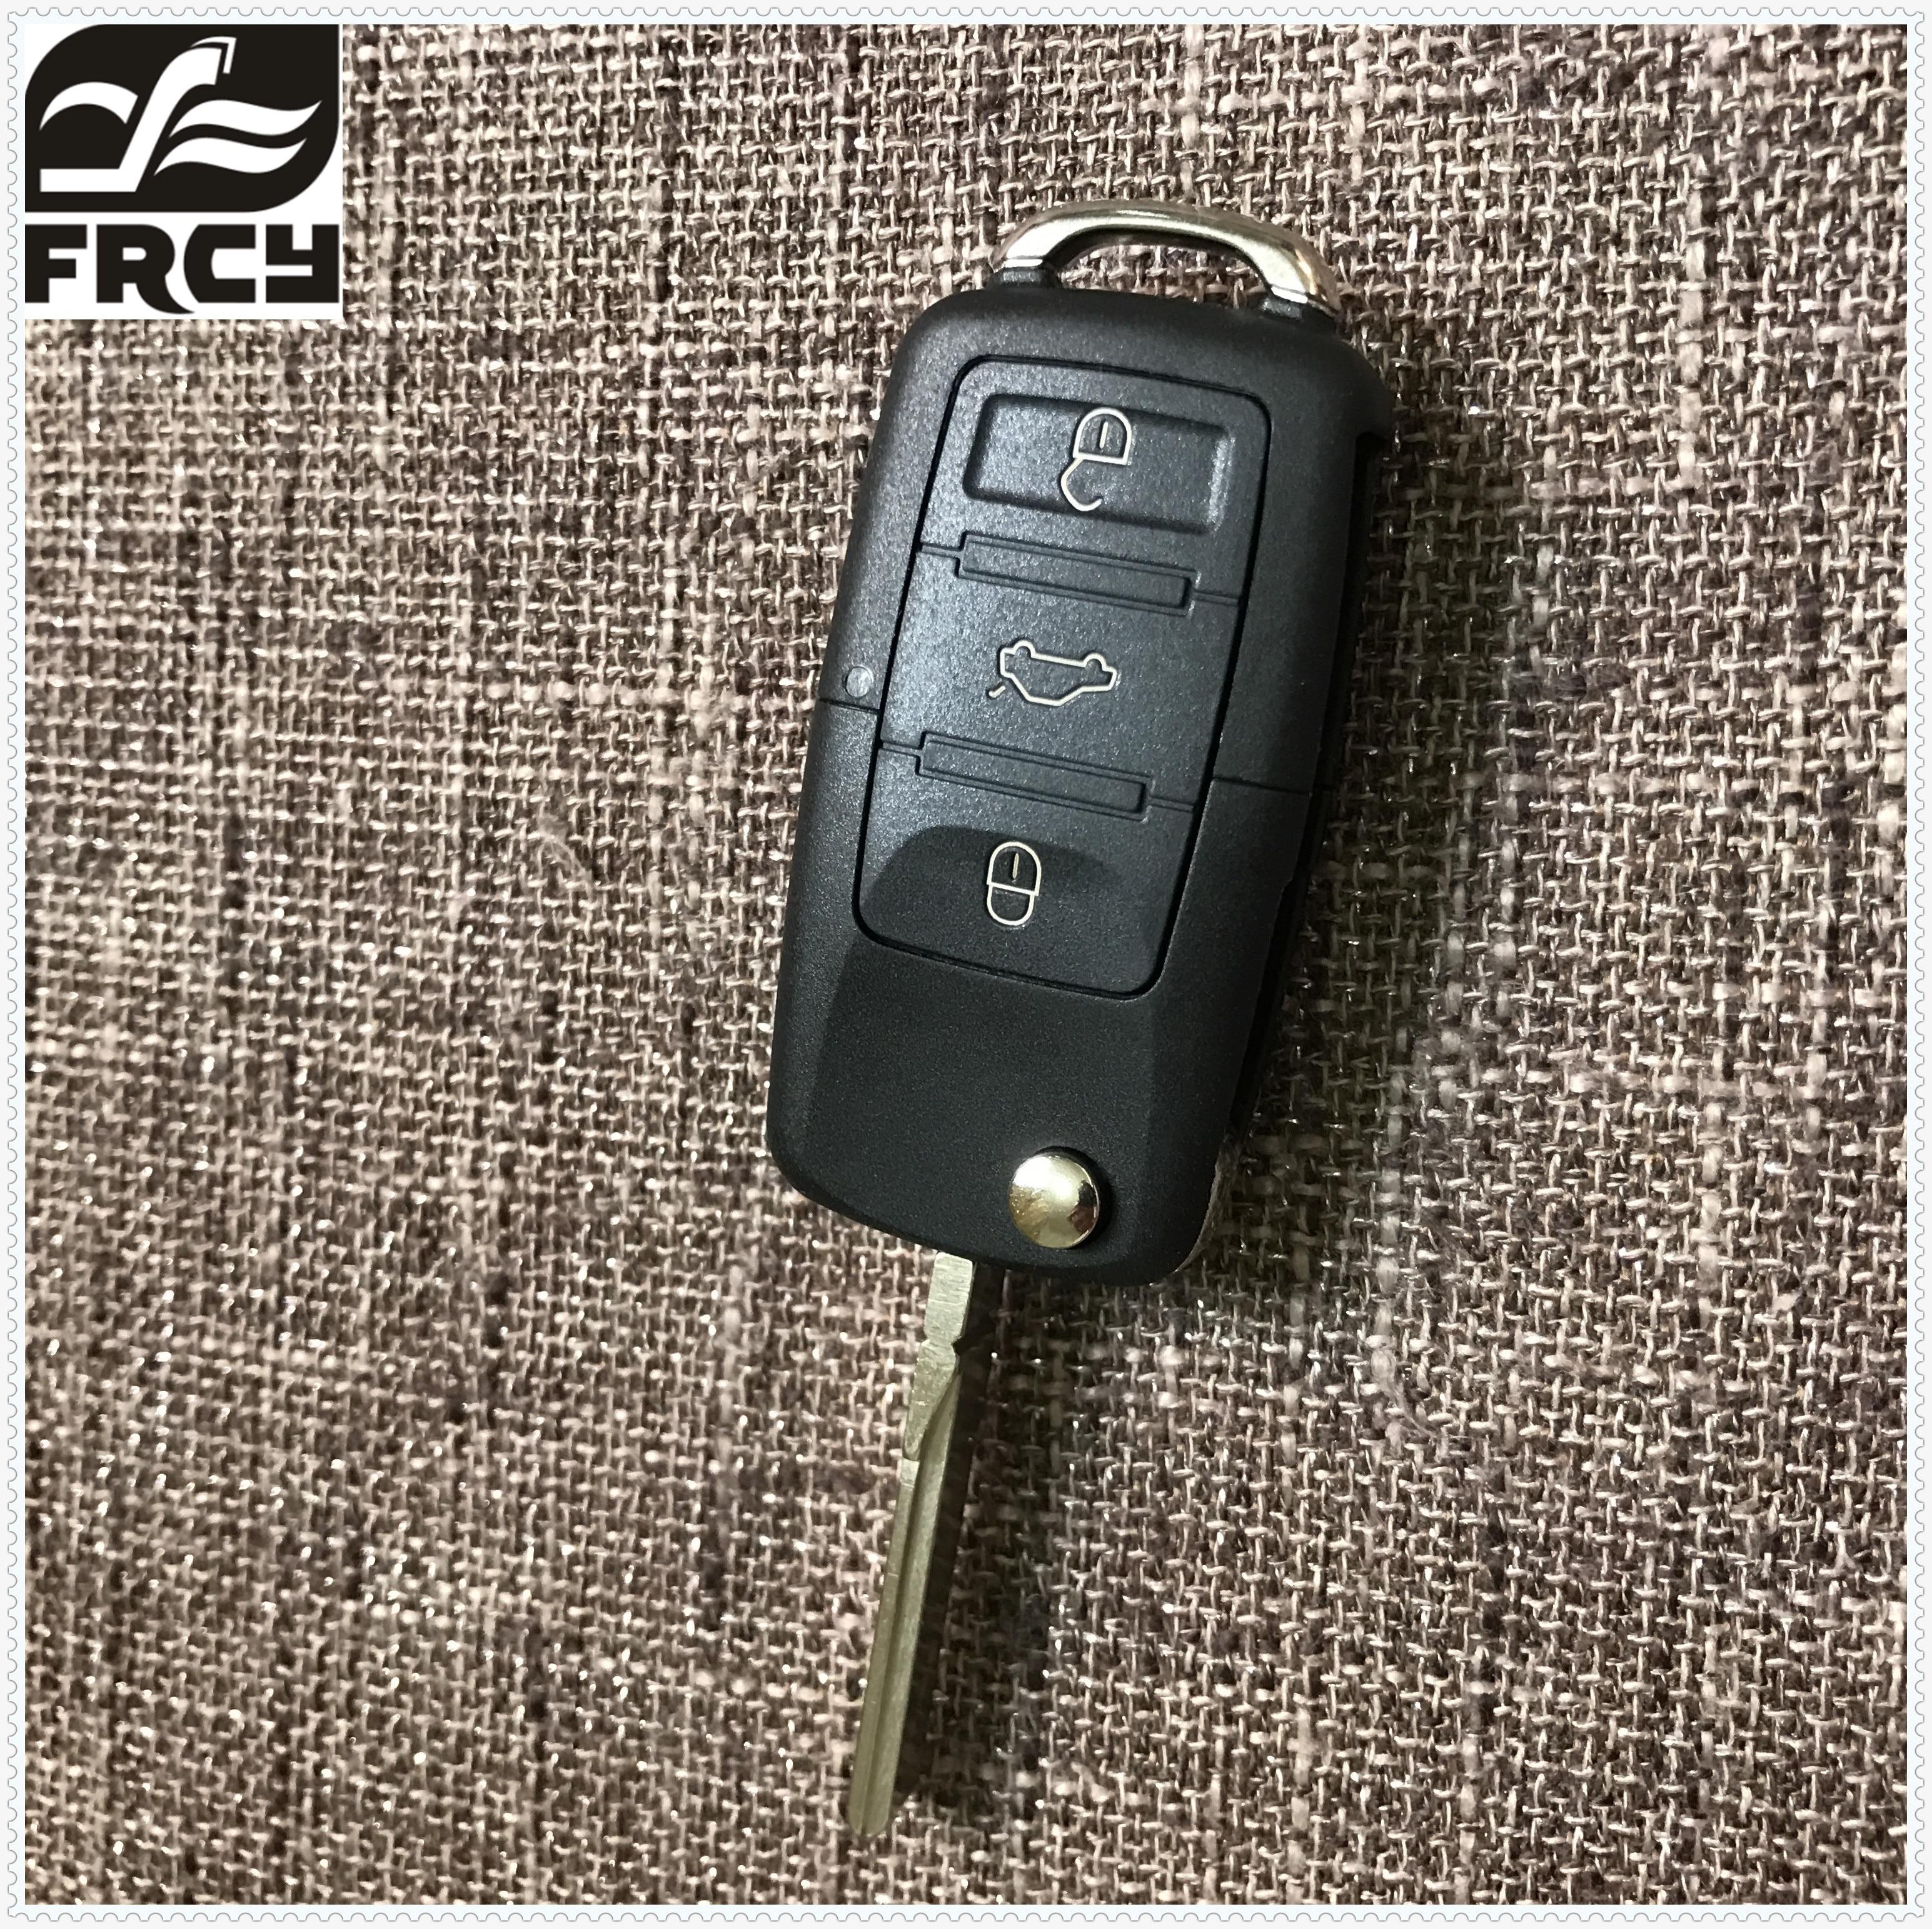 цена на New 3 BN Folding Car Flip Remote Key Replacement blank Case FOB Shell For Vw VOLKSWAGEN Seat Skoda